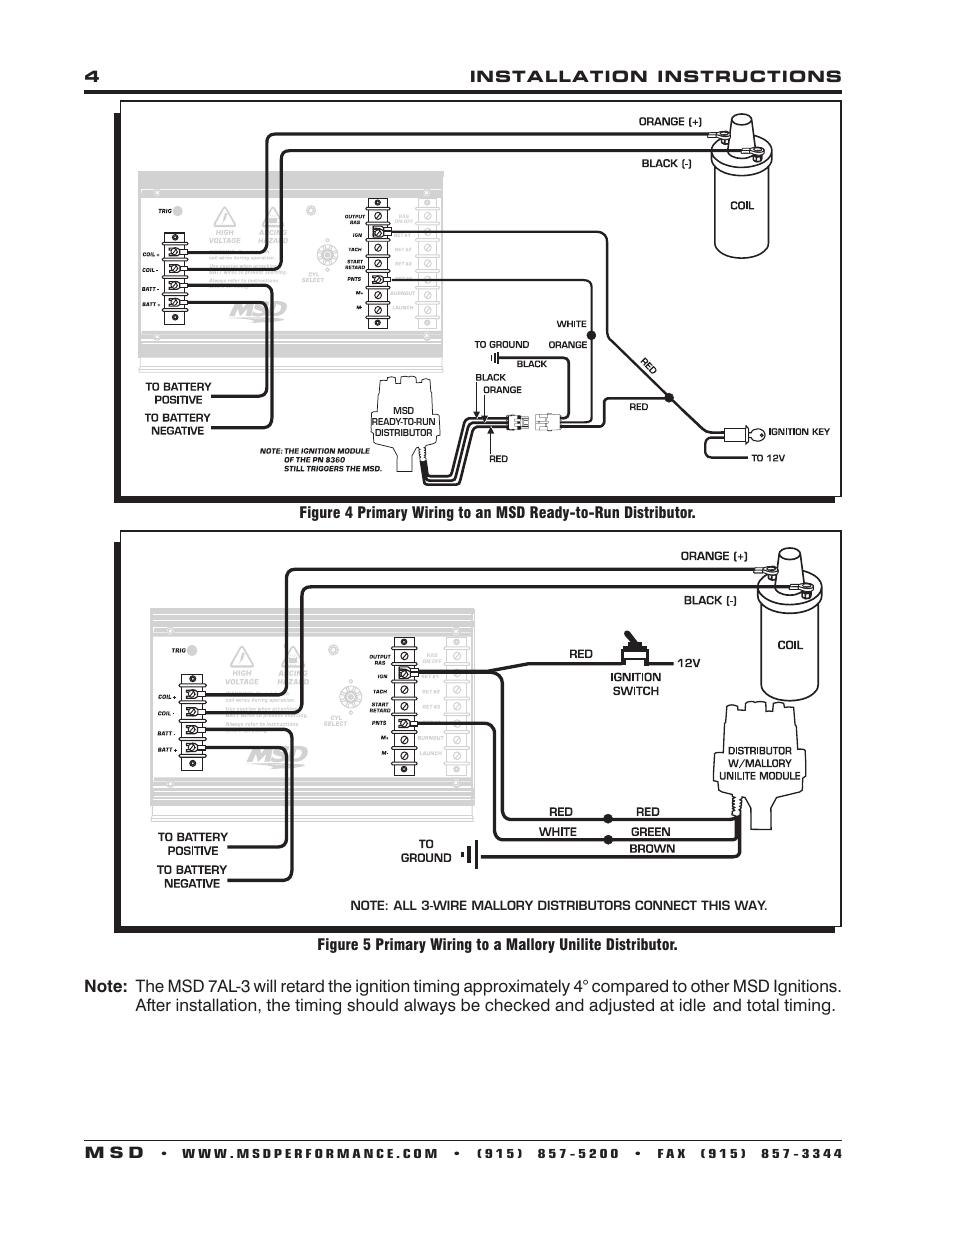 medium resolution of 4installation instructions m s d msd 7330 7al 3 ignition control installation user manual page 4 12